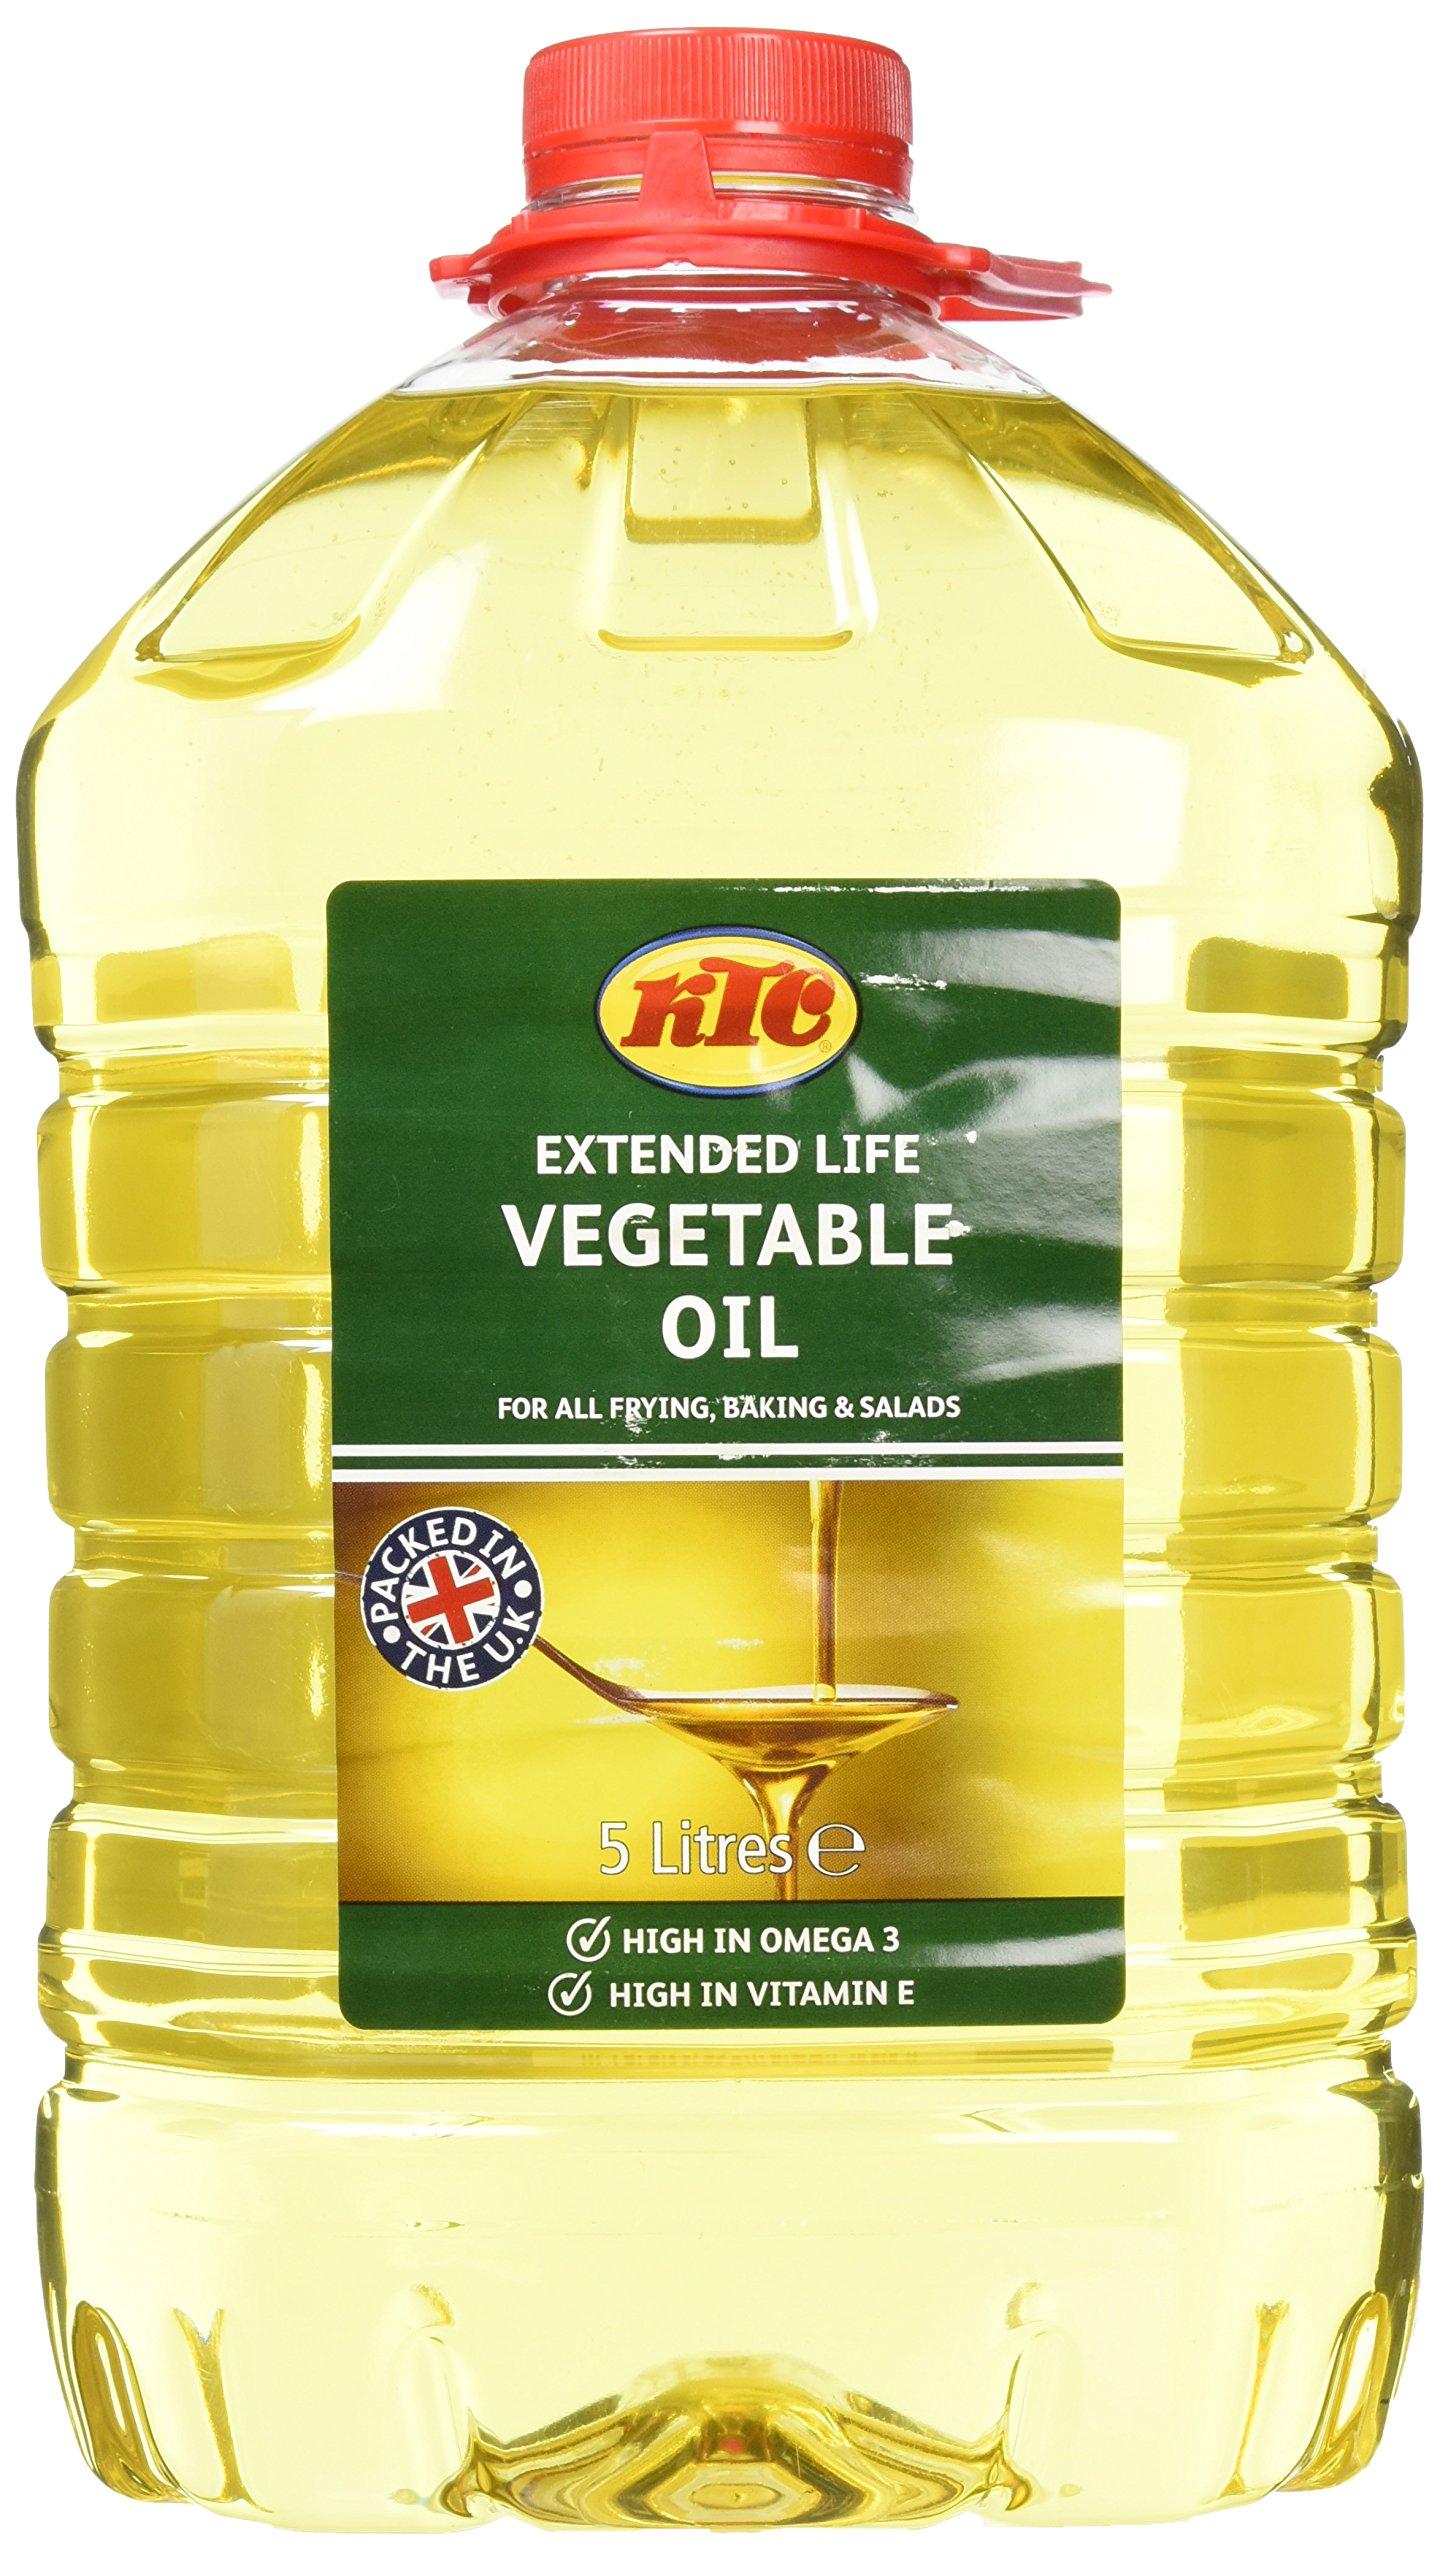 KTC Vegetable Oil, 5L